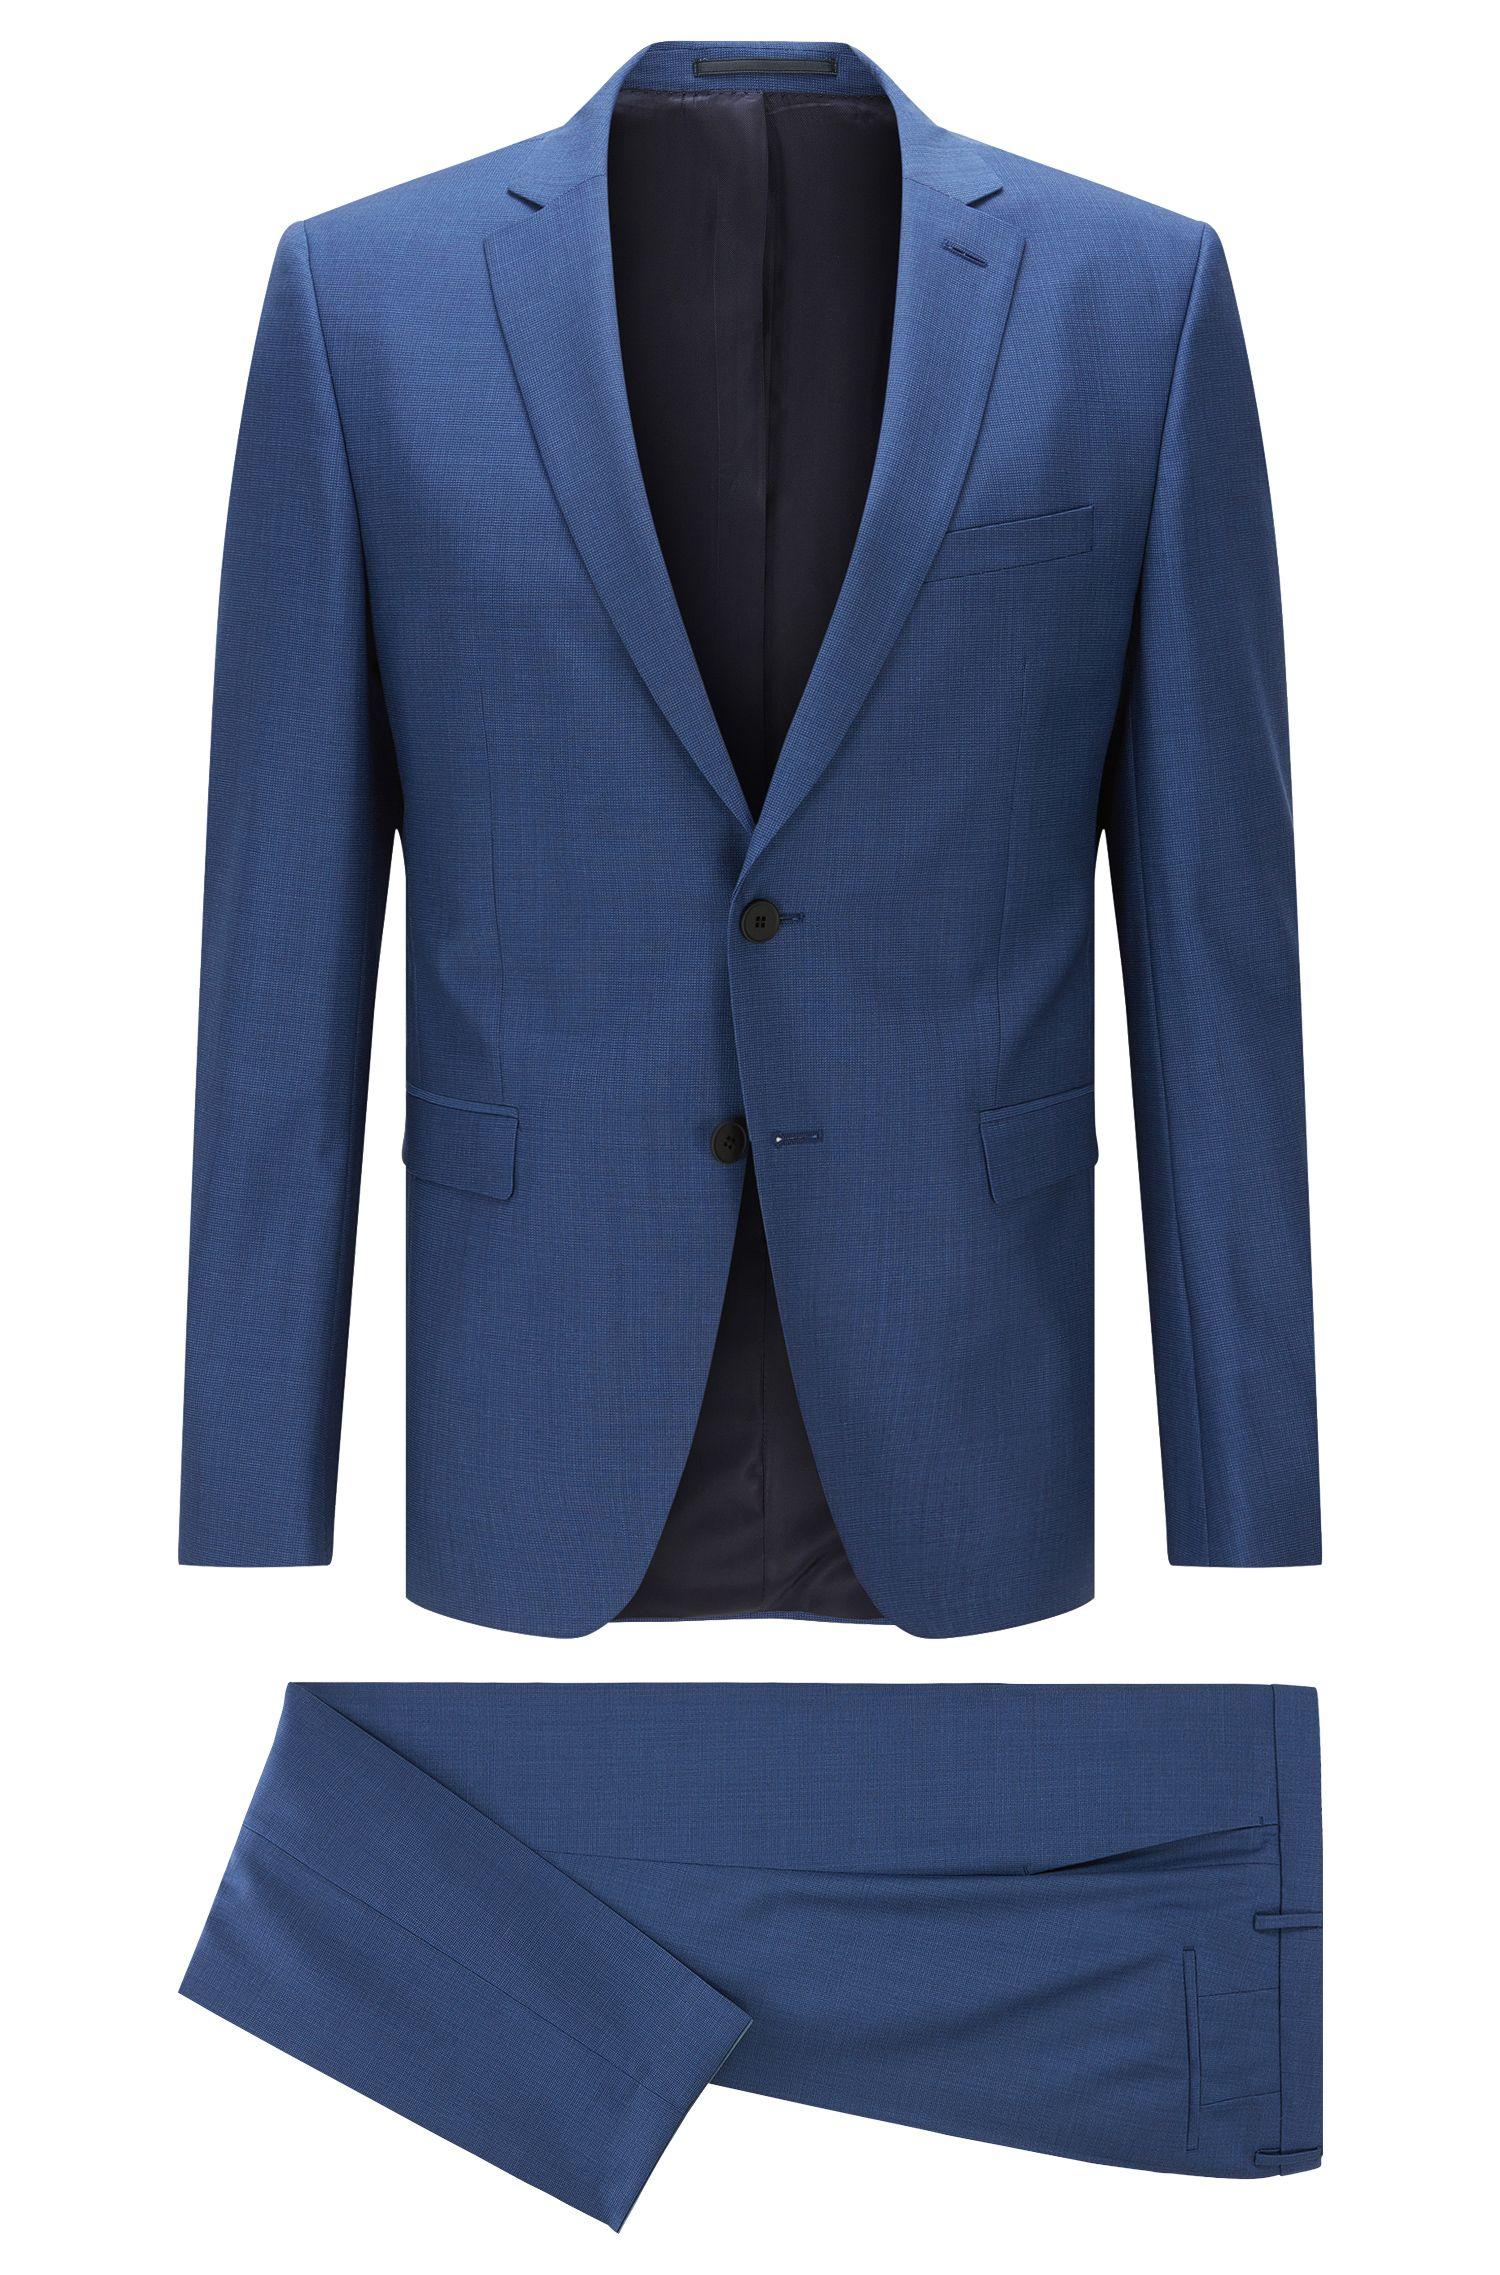 Sharkskin Super 100 Virgin Wool Suit, Extra Slim Fit | Reymond/Wenton